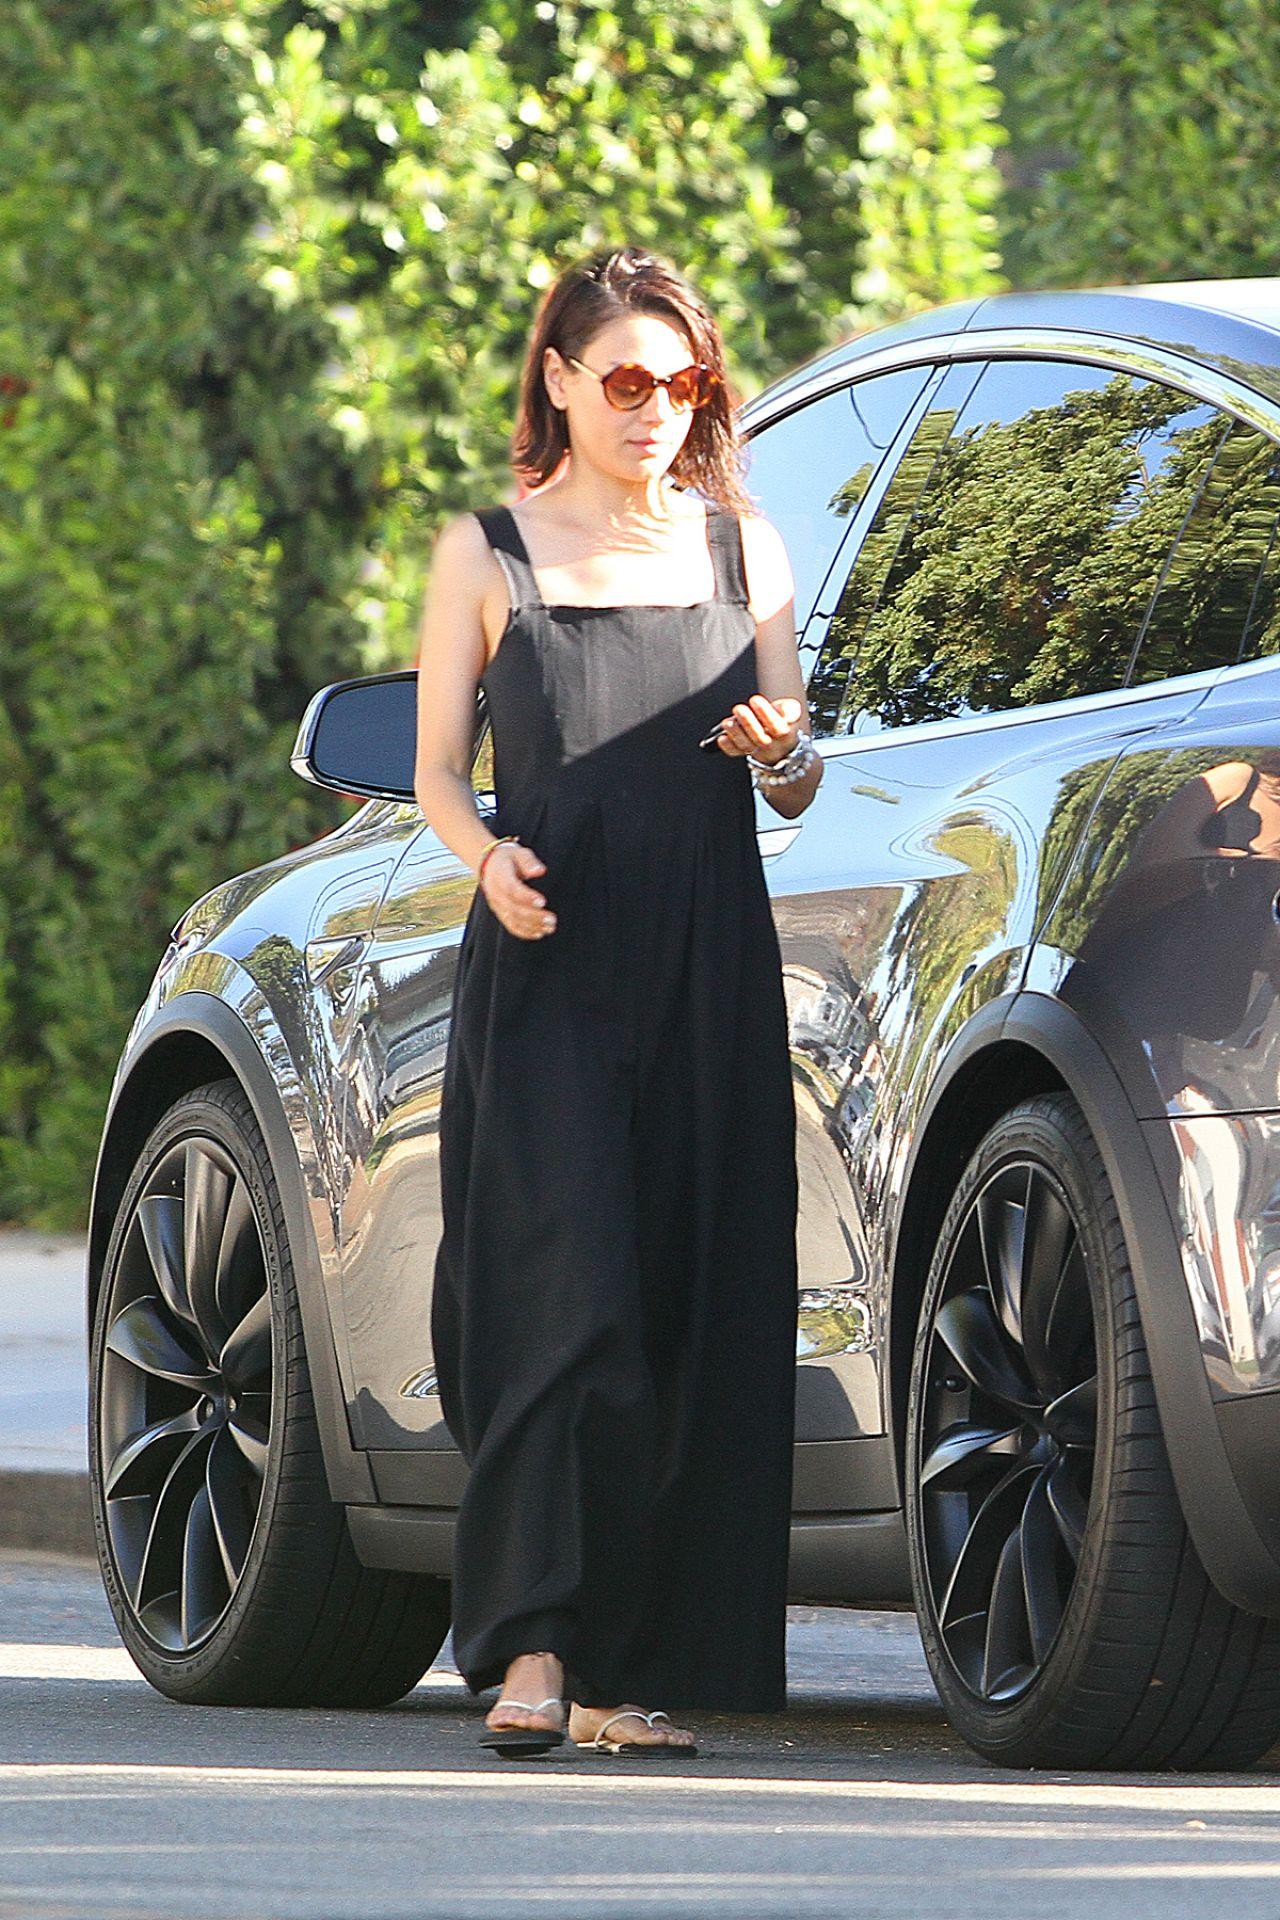 Mila Kunis Anal Creampie Mila Kunis Uncensored Mila Kunis Out In Los Angeles Celebrity 1